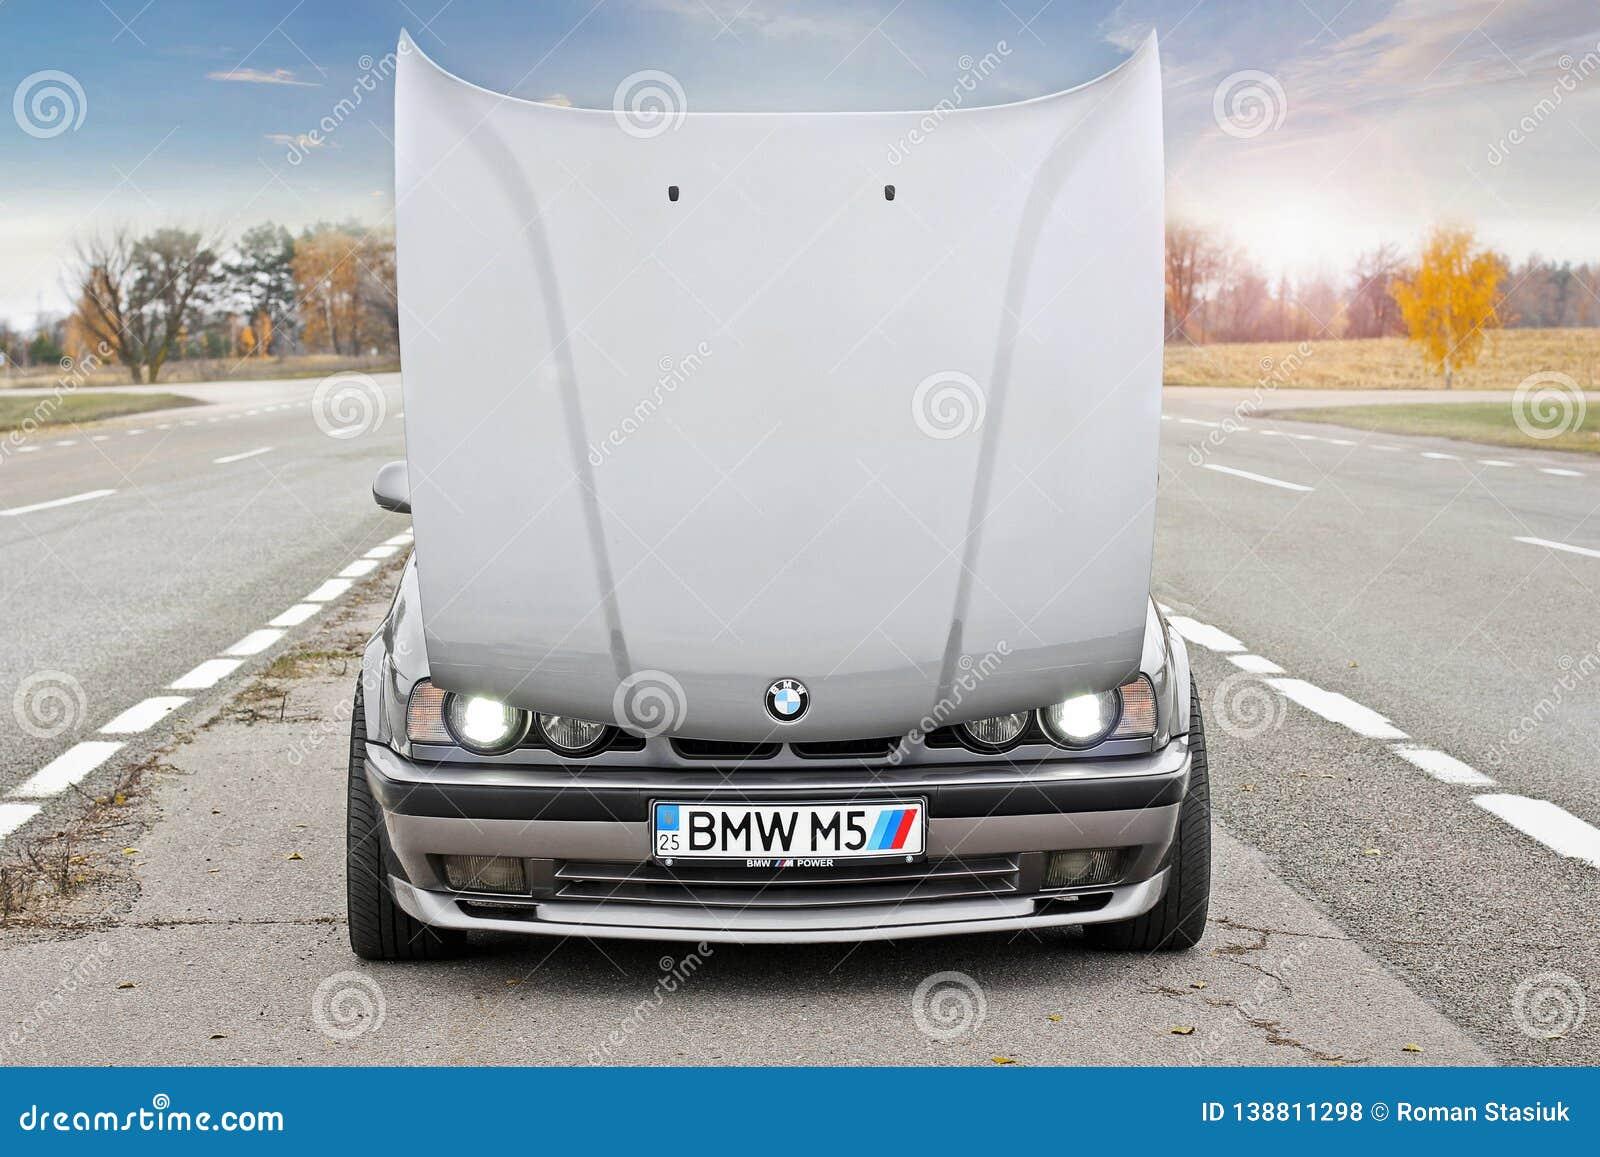 Chernigov, Ukraine - November 8, 2017  BMW M5 E34  Gray BMW